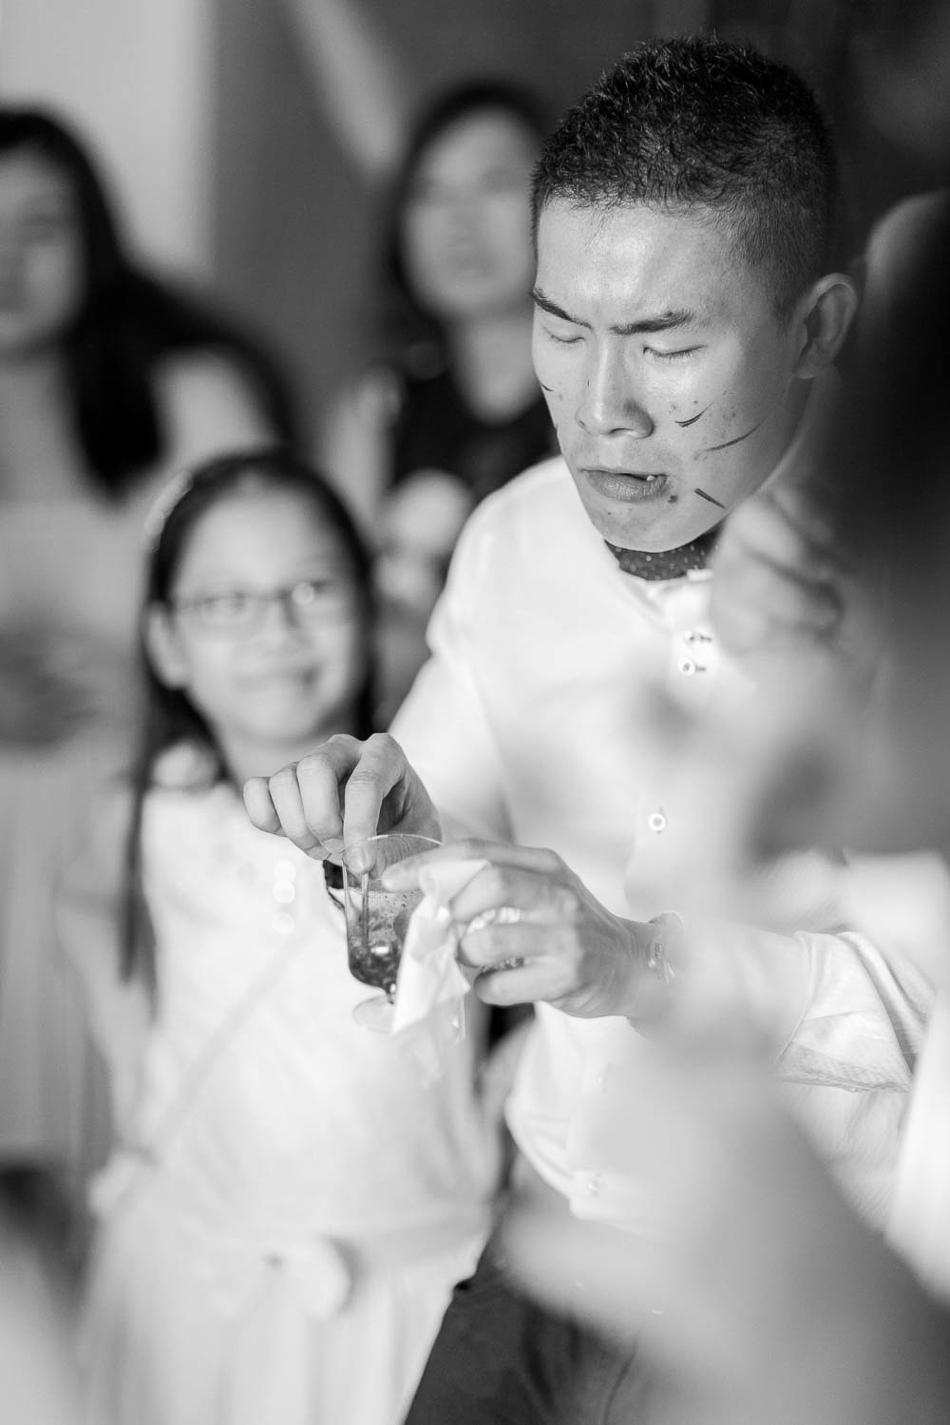 wedding-photographer-singapore-film-photographer-chen-sands-MinKang-wedding-CSPBLOG-17.jpg